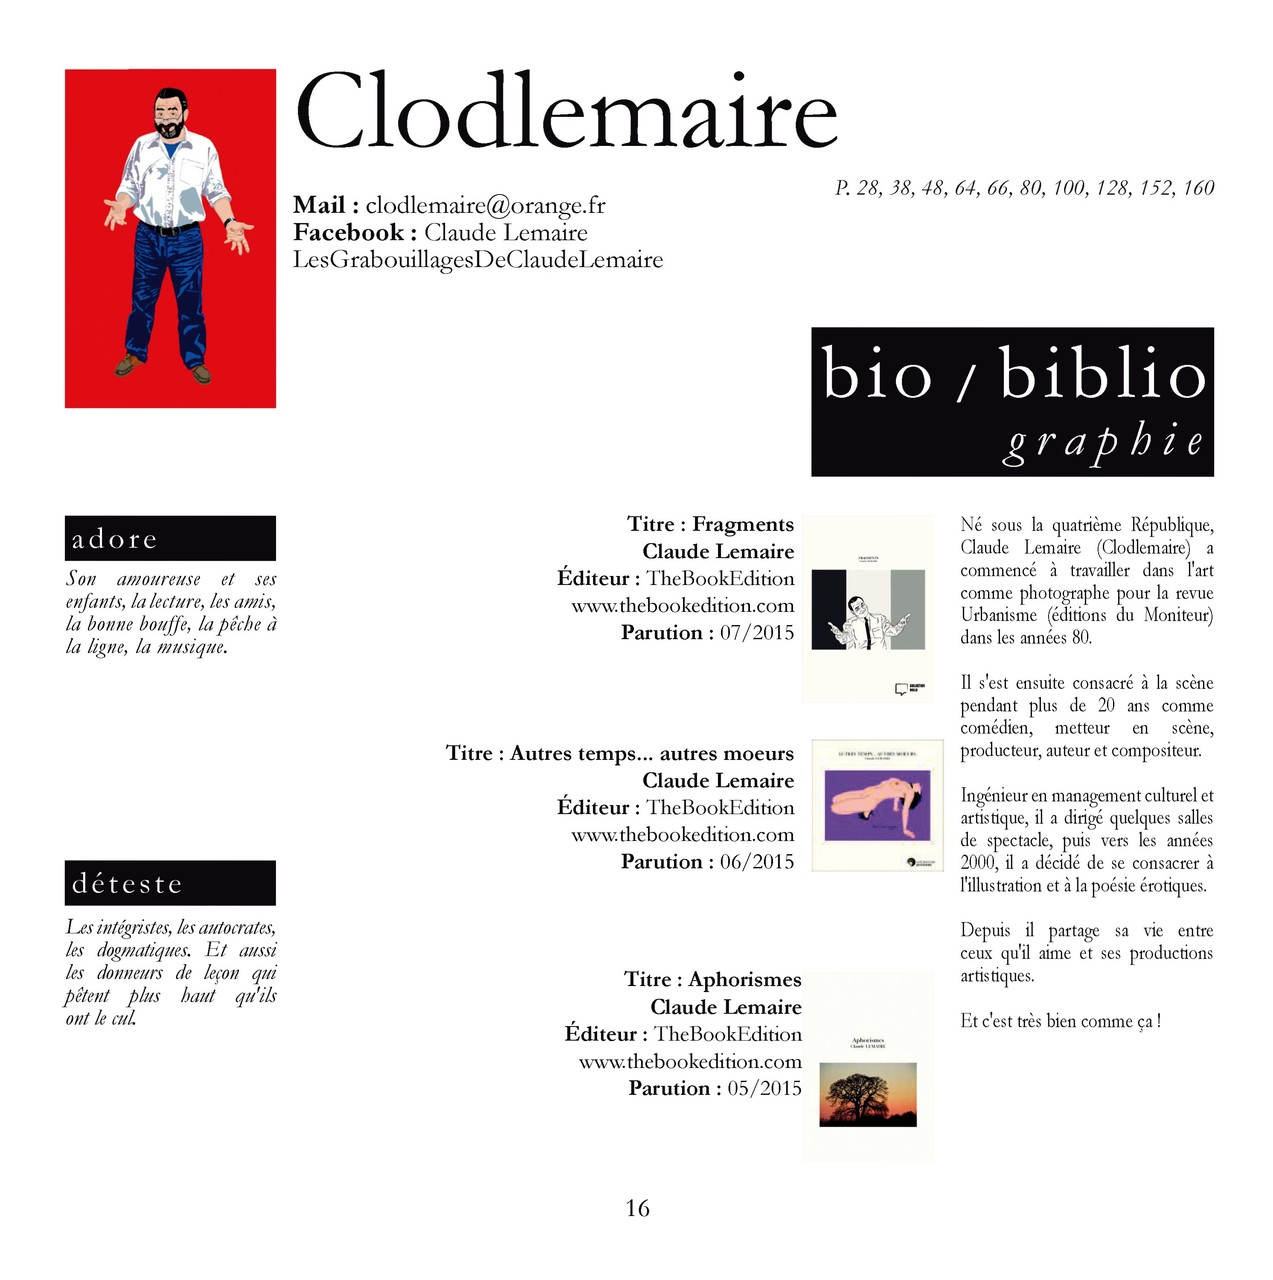 CLODLEMAIRE